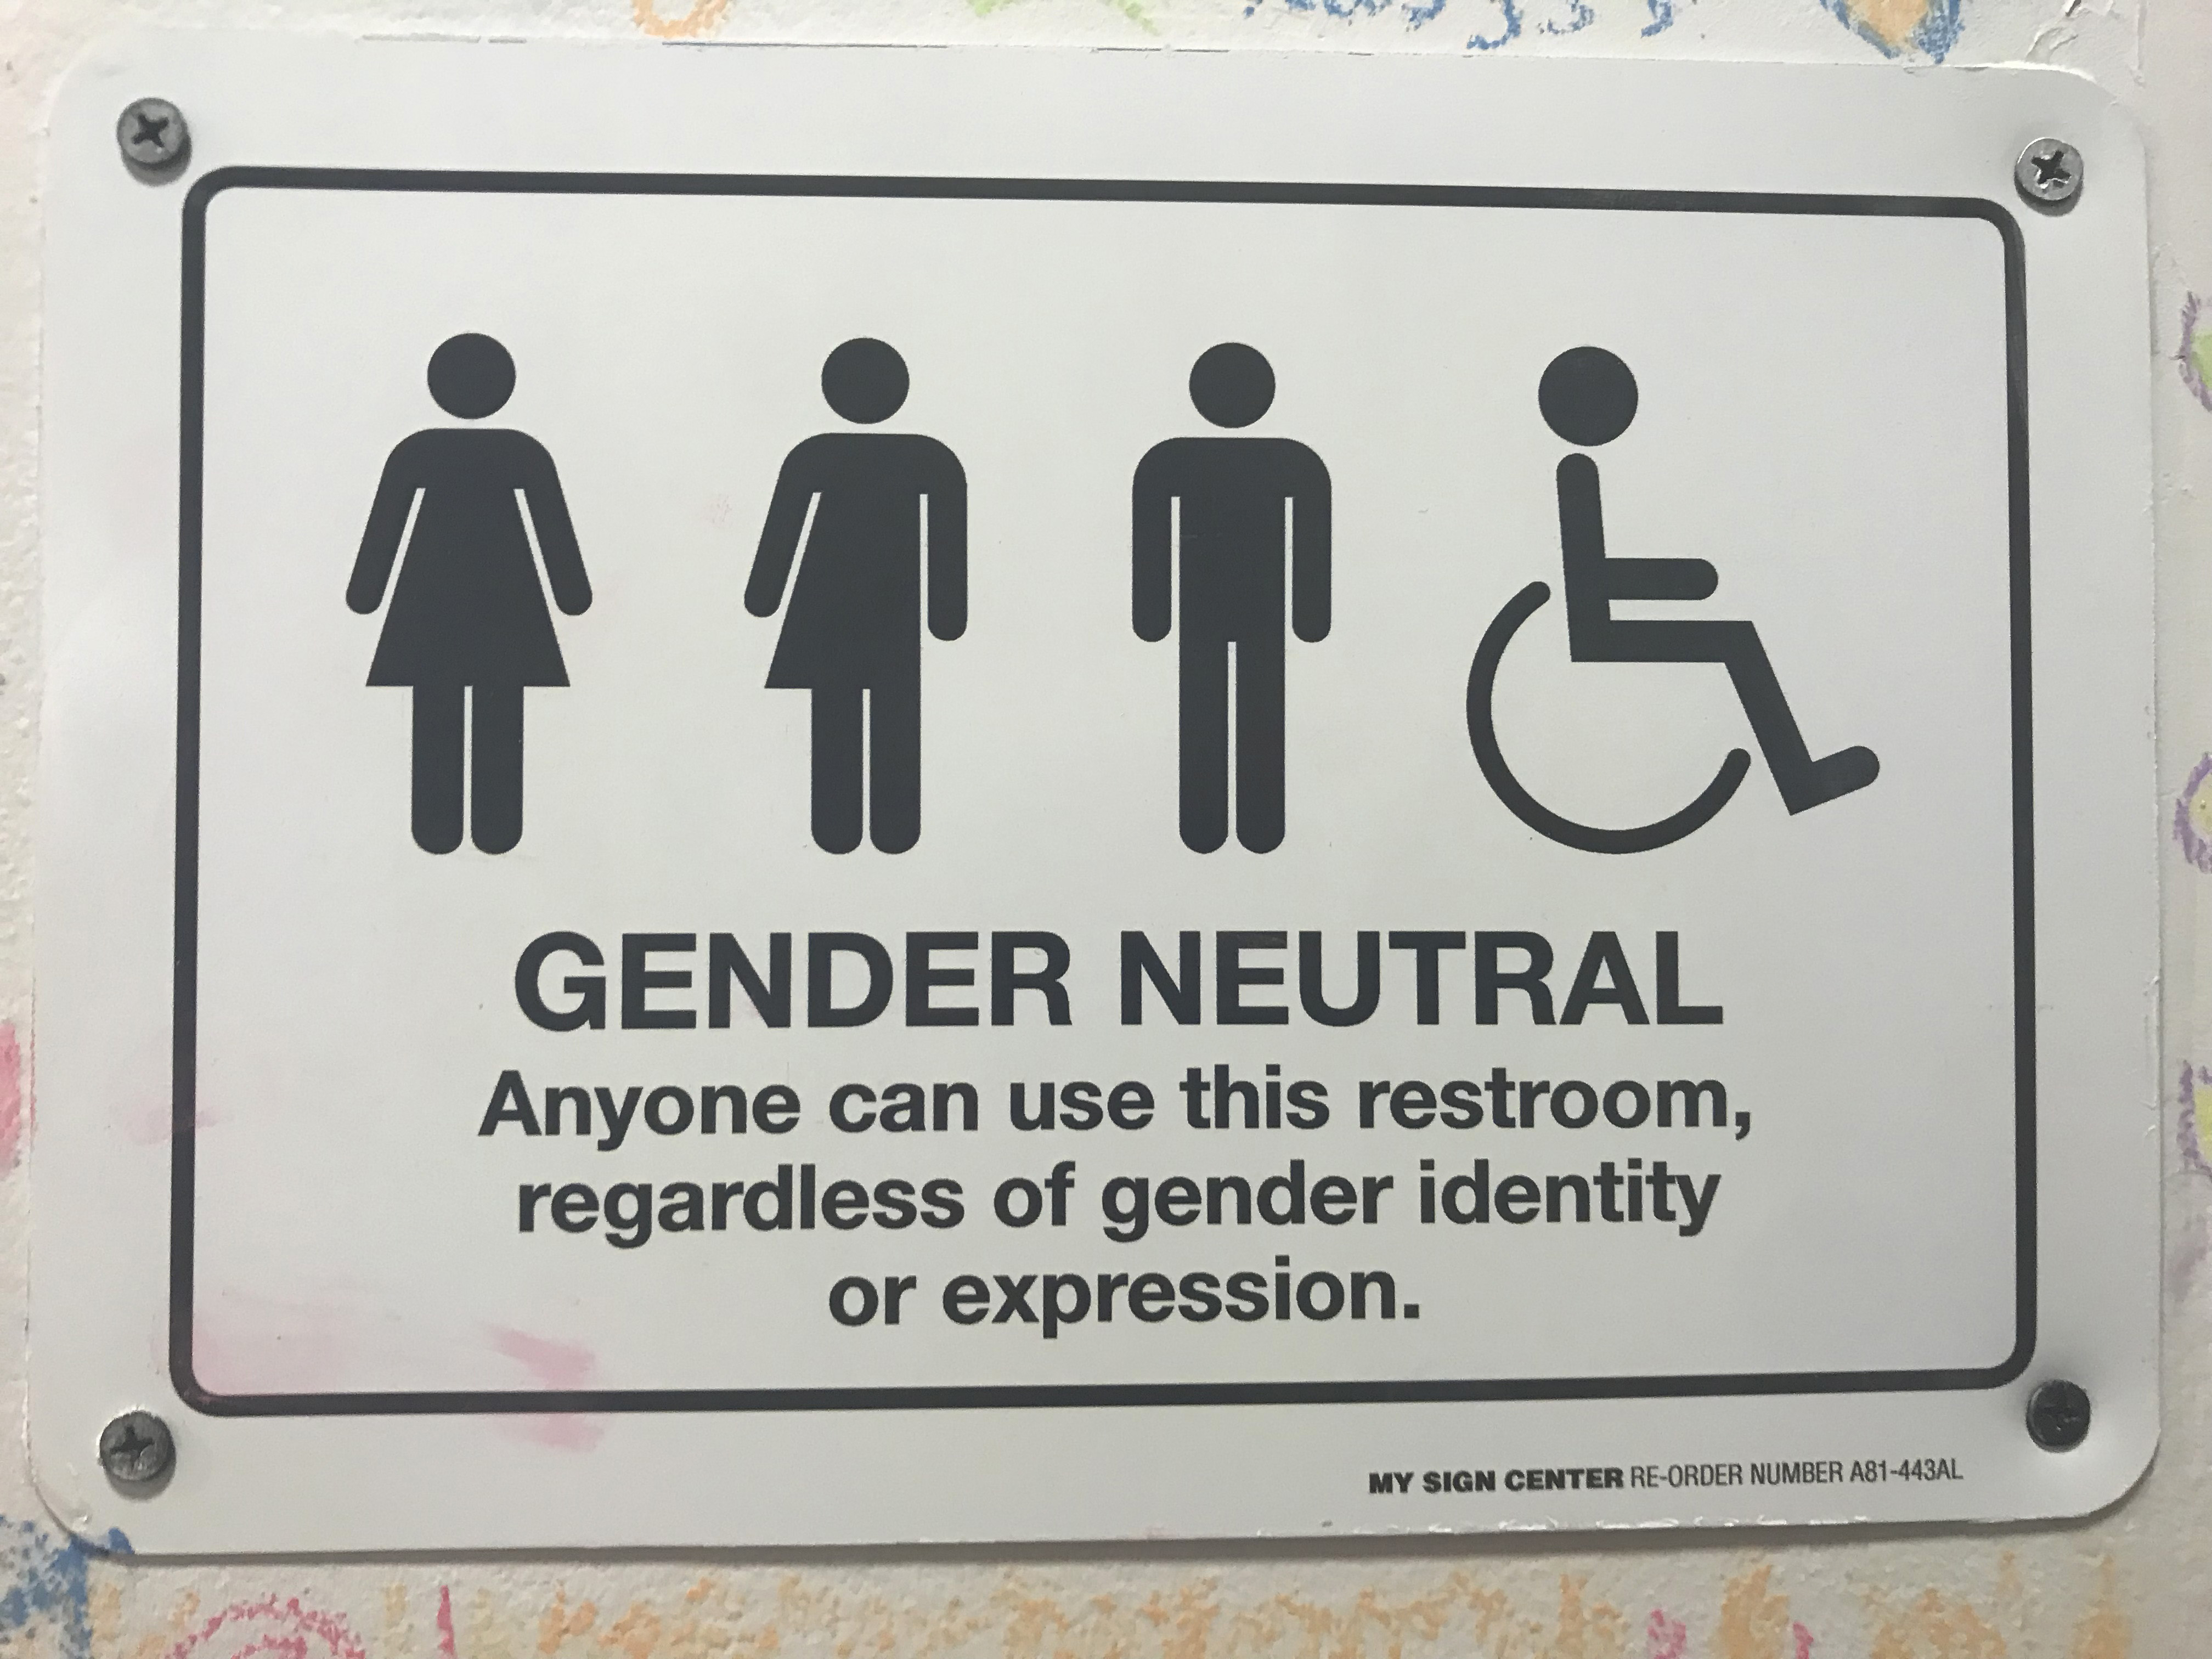 Sexual orientation panelite